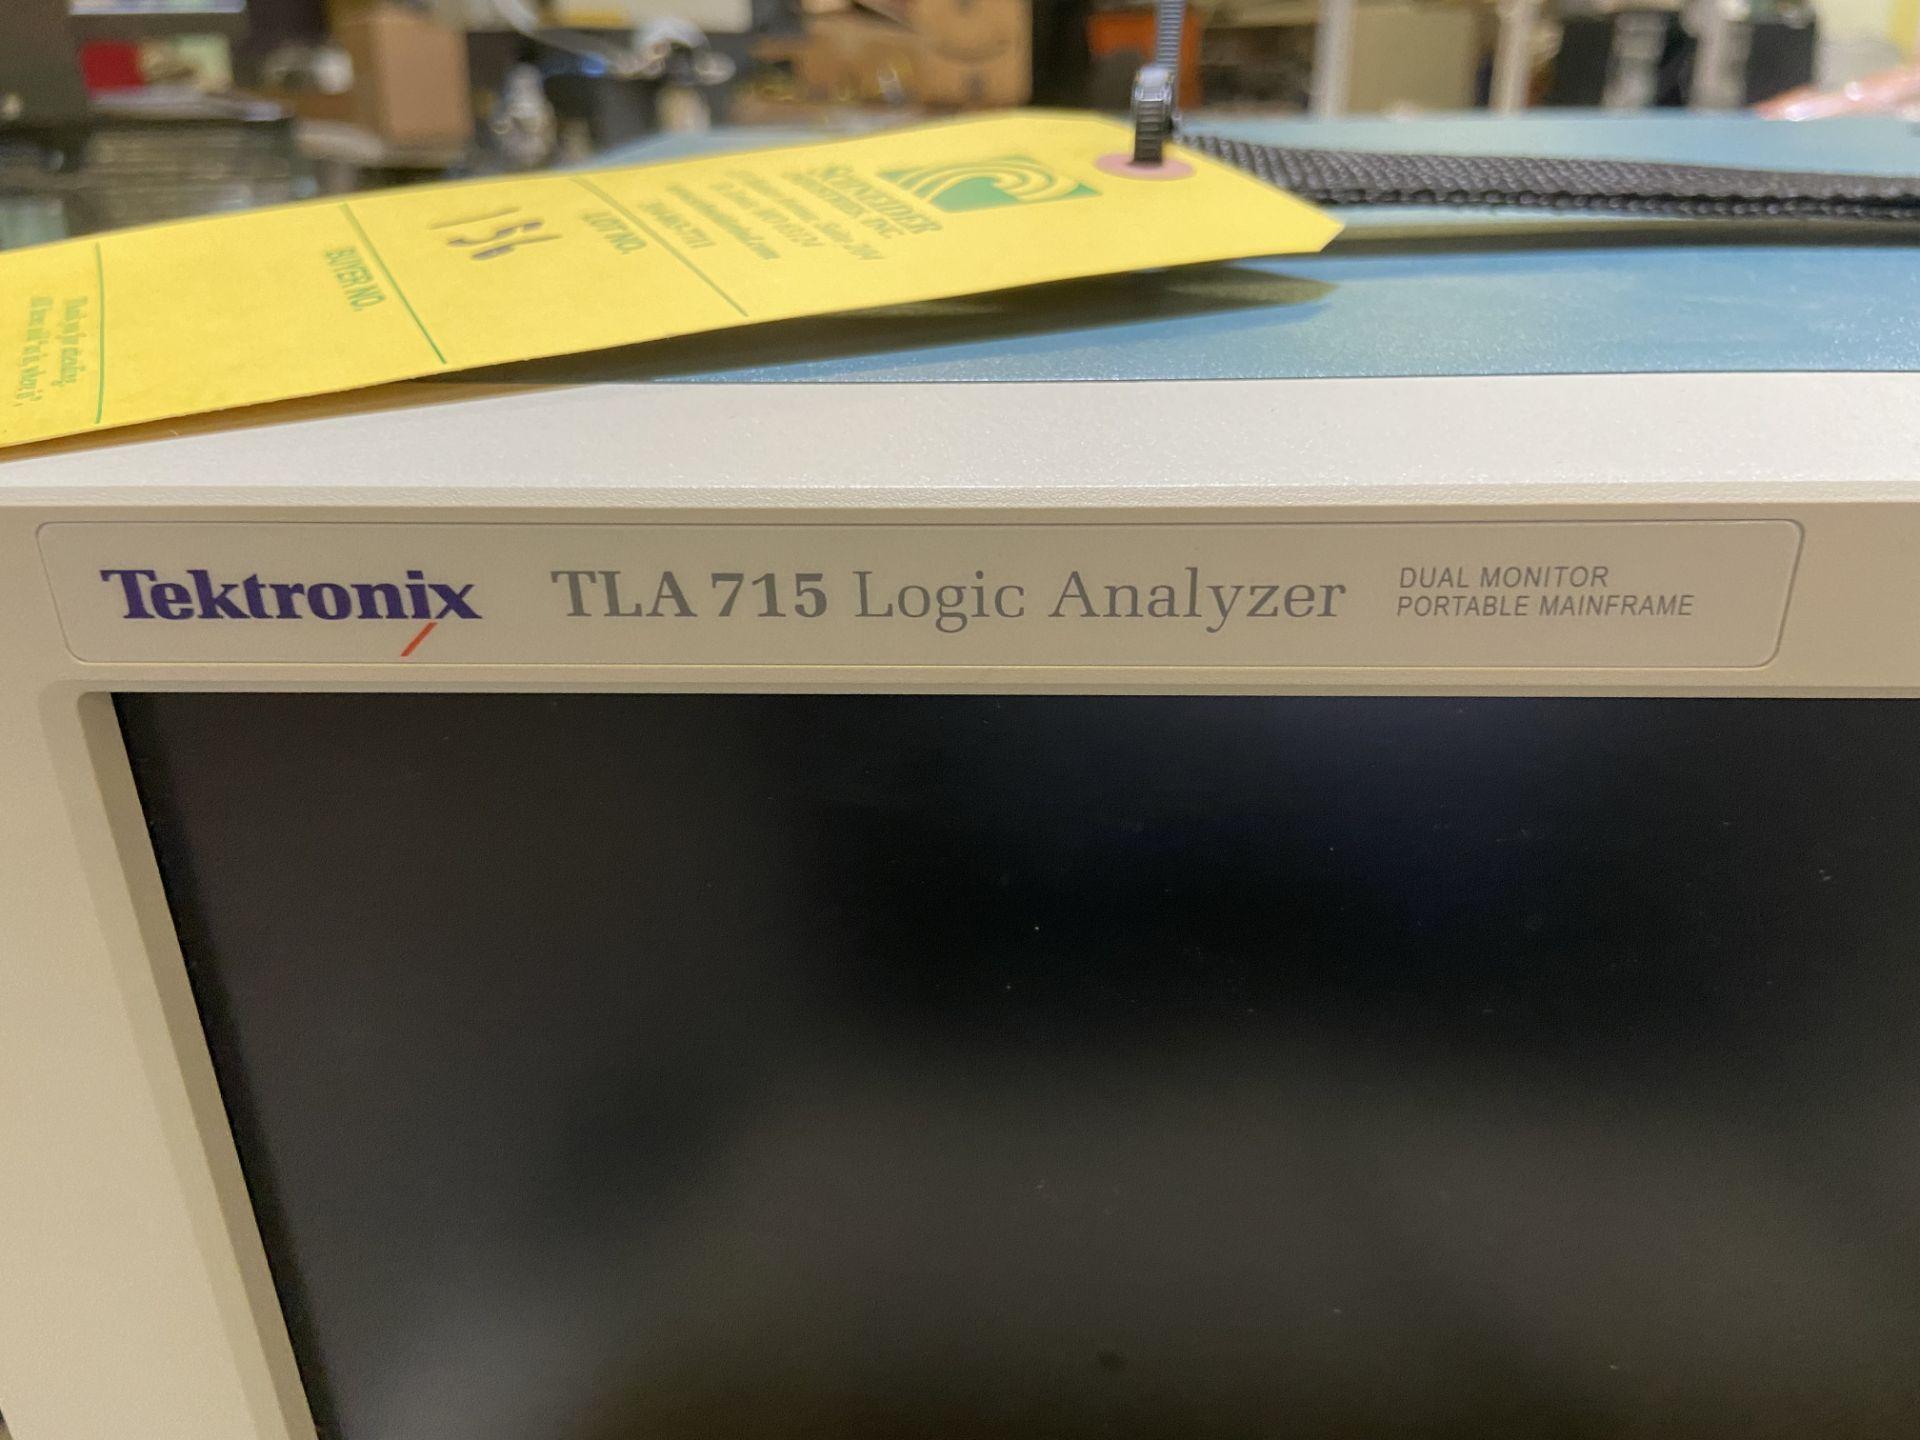 Tektronix TLA 715 Logic Analyzer, Rigging Fee: $50 - Image 3 of 10